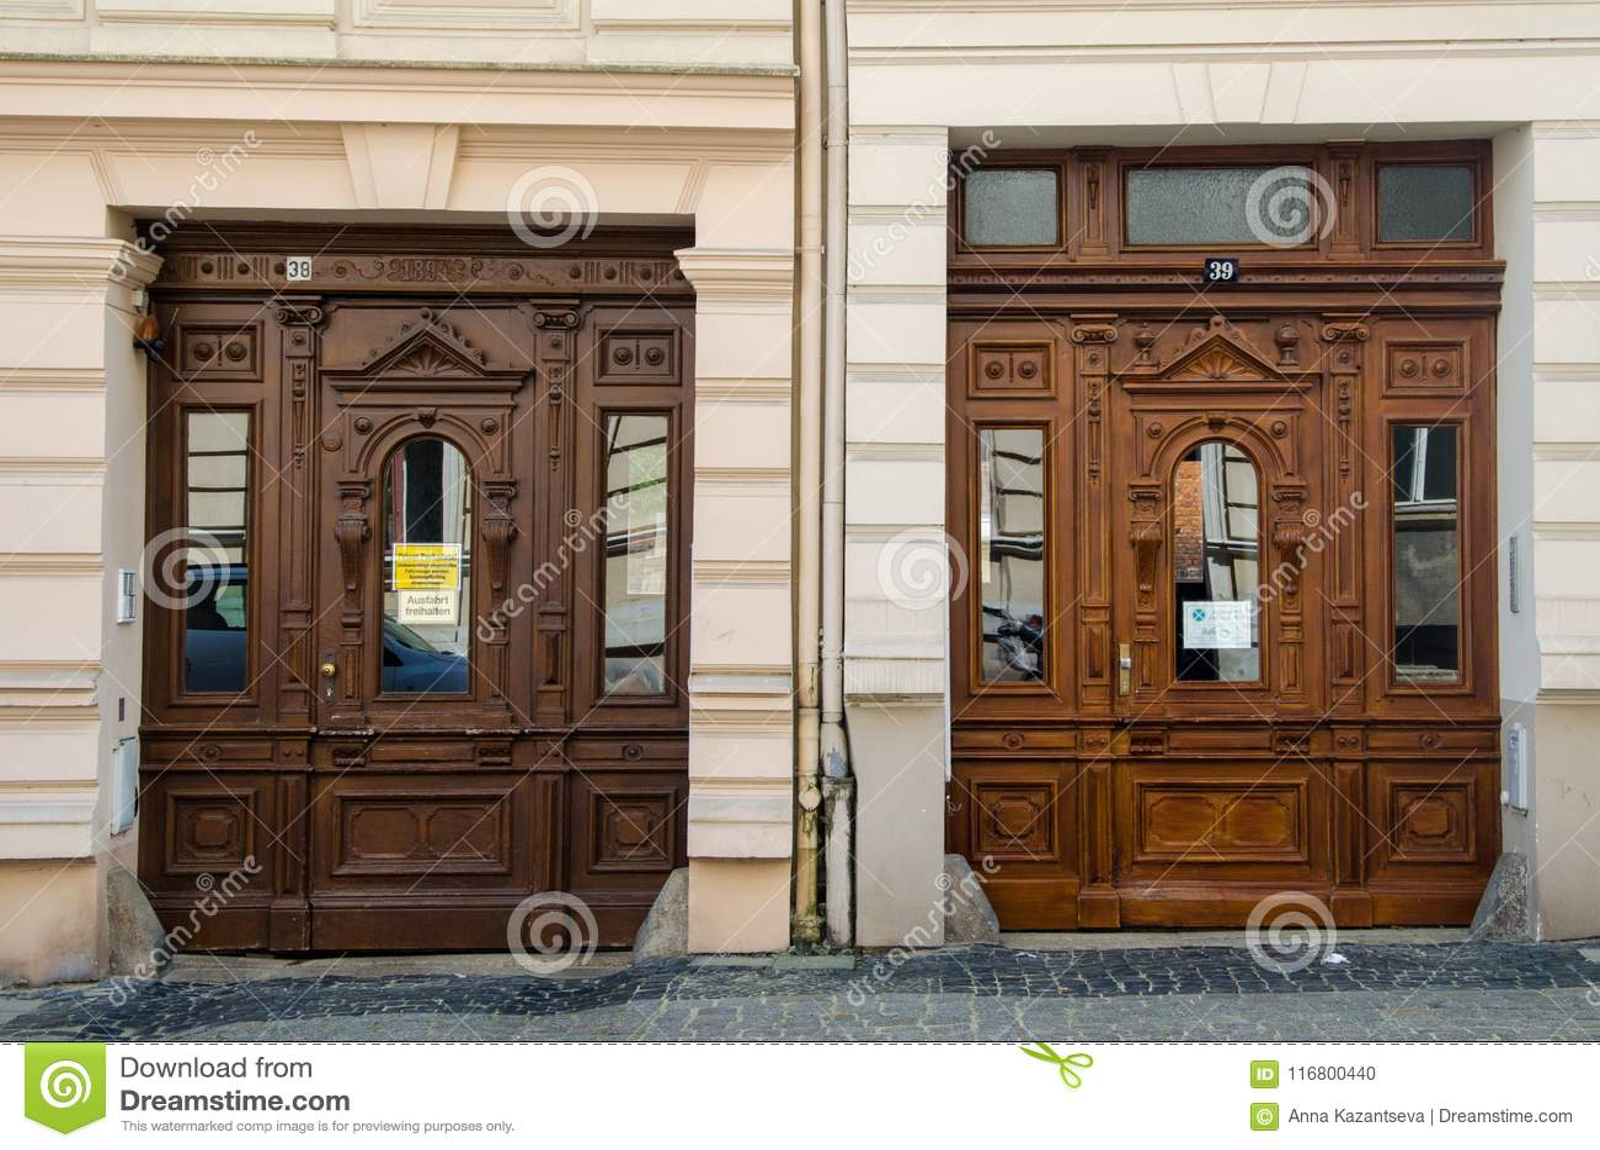 Two similar ancient decorated doors in Gorlitz, Germany